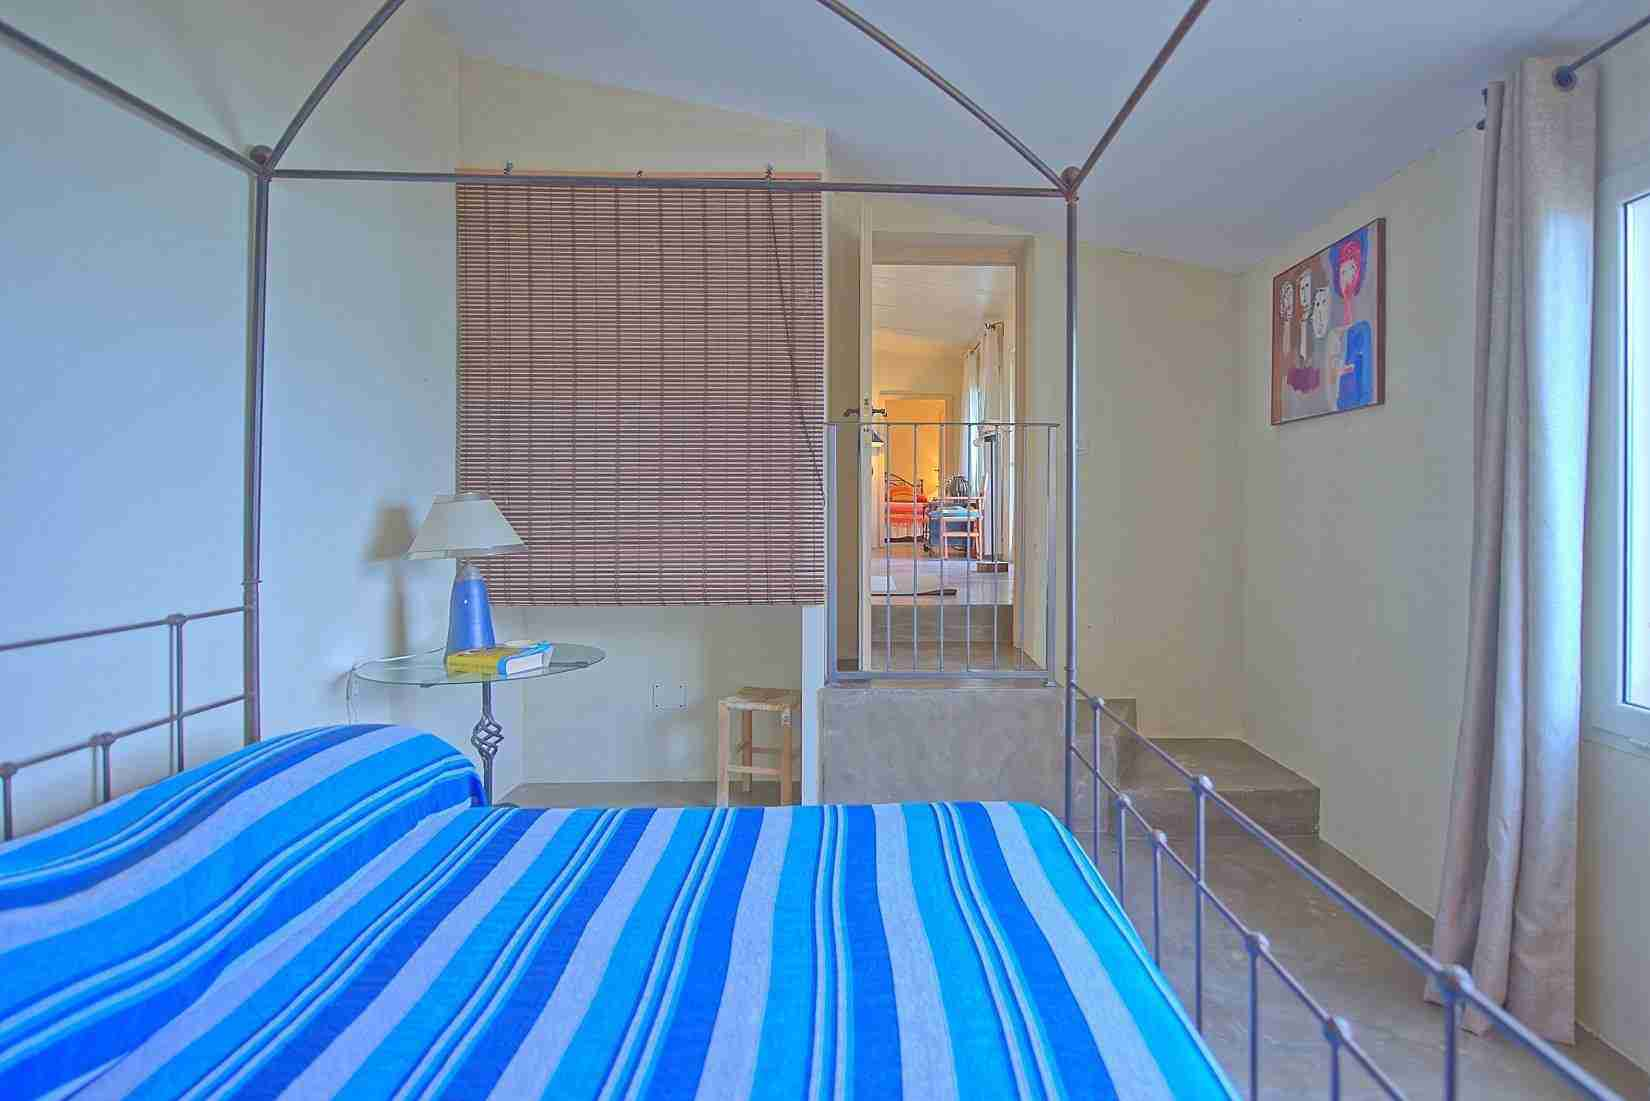 29 Mura del Bastione Blue Bedroom